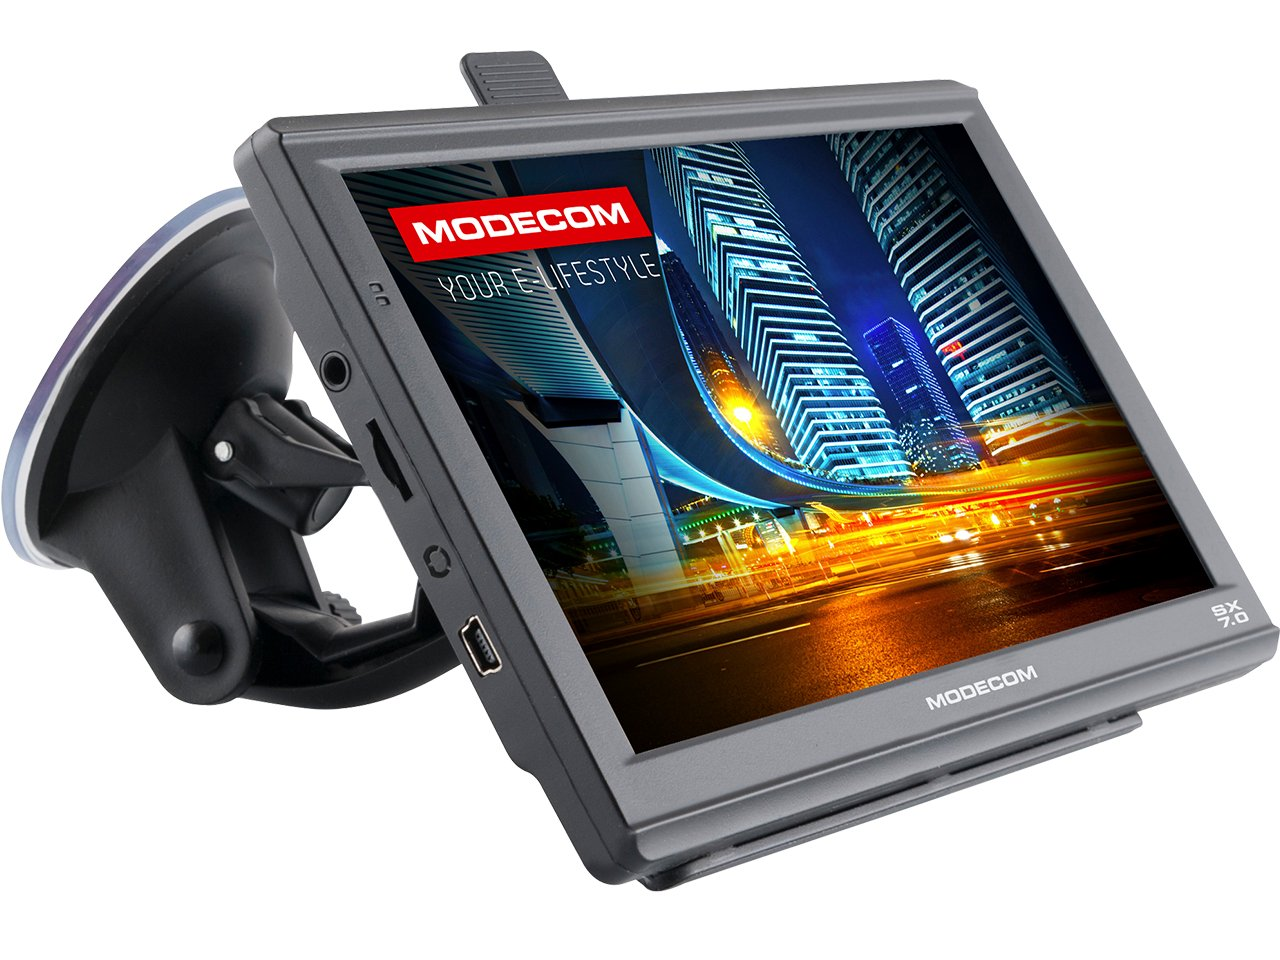 GPS-НАВИГАЦИЯ 7 ДЮЙМОВ MODECOM SX 7.0 - РАЗБЛОКИРОВАНО!